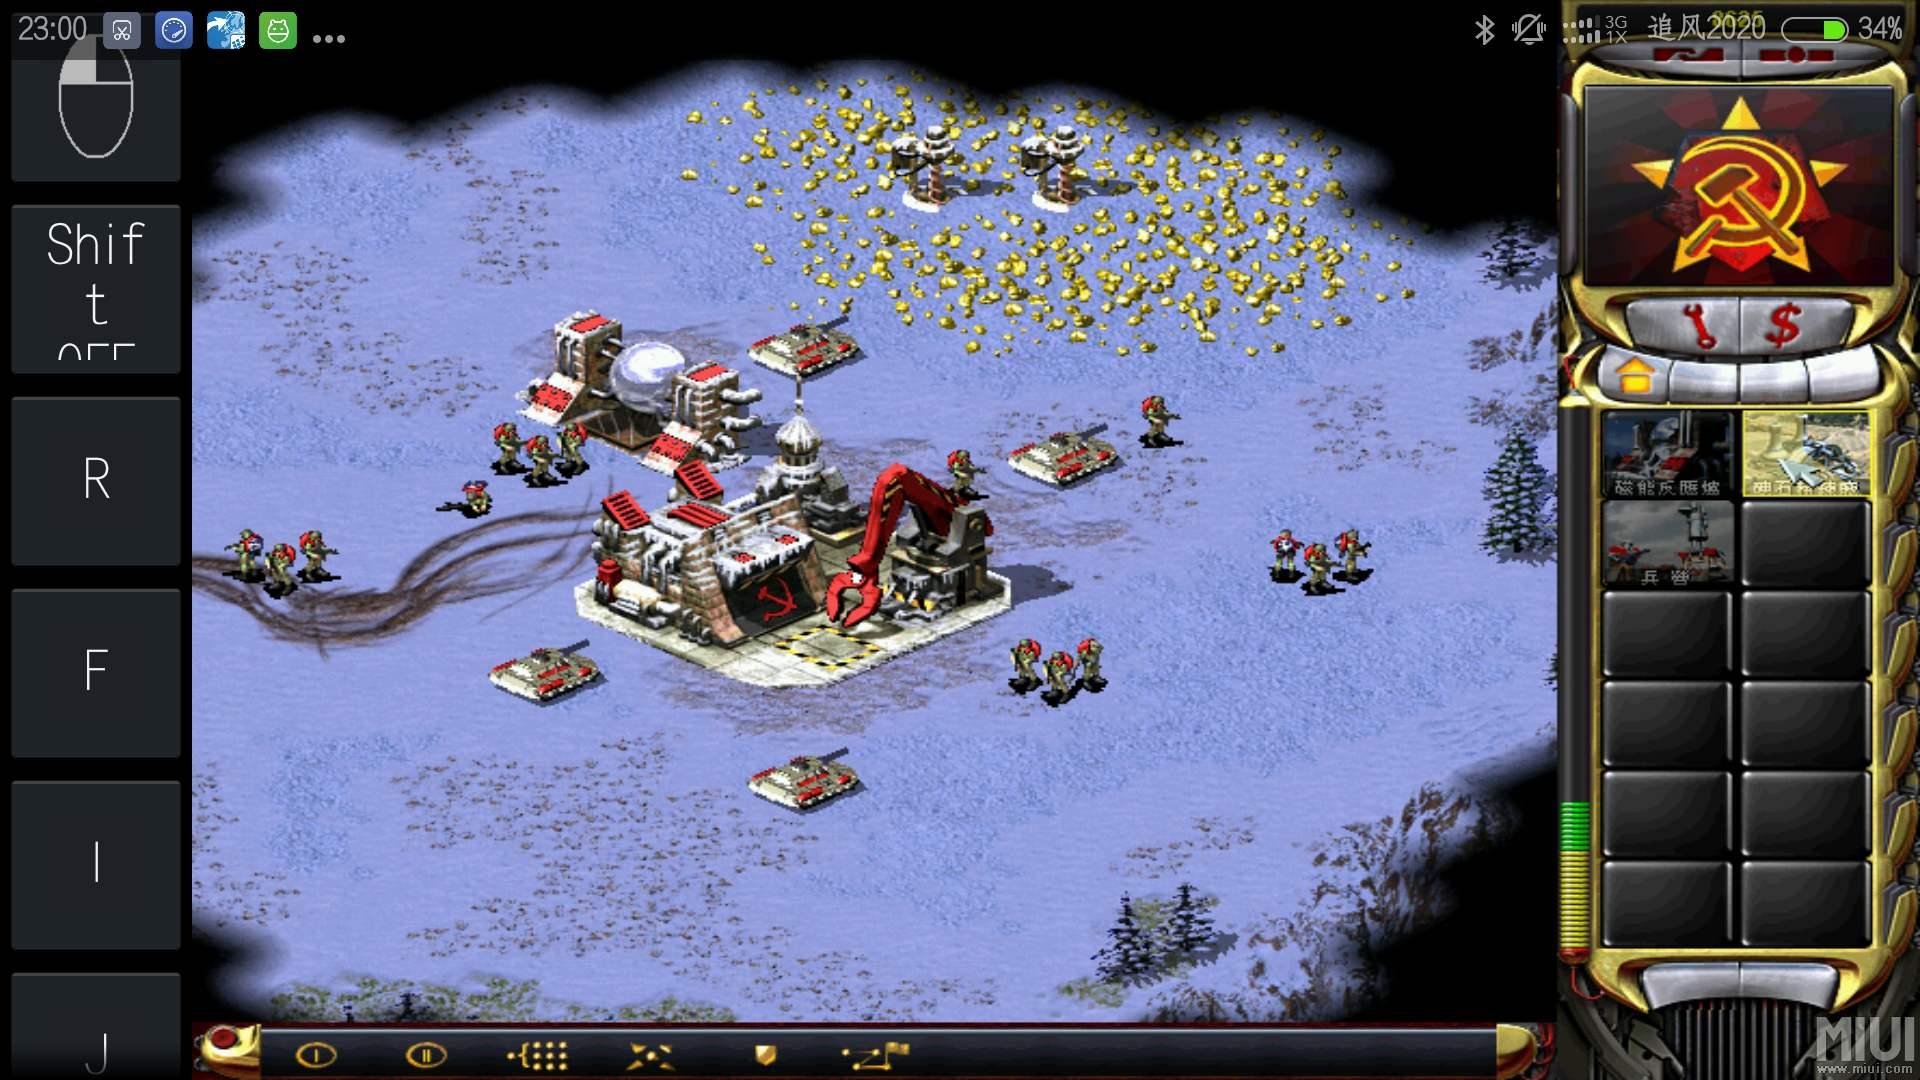 exgear让安卓重温PC经典游戏